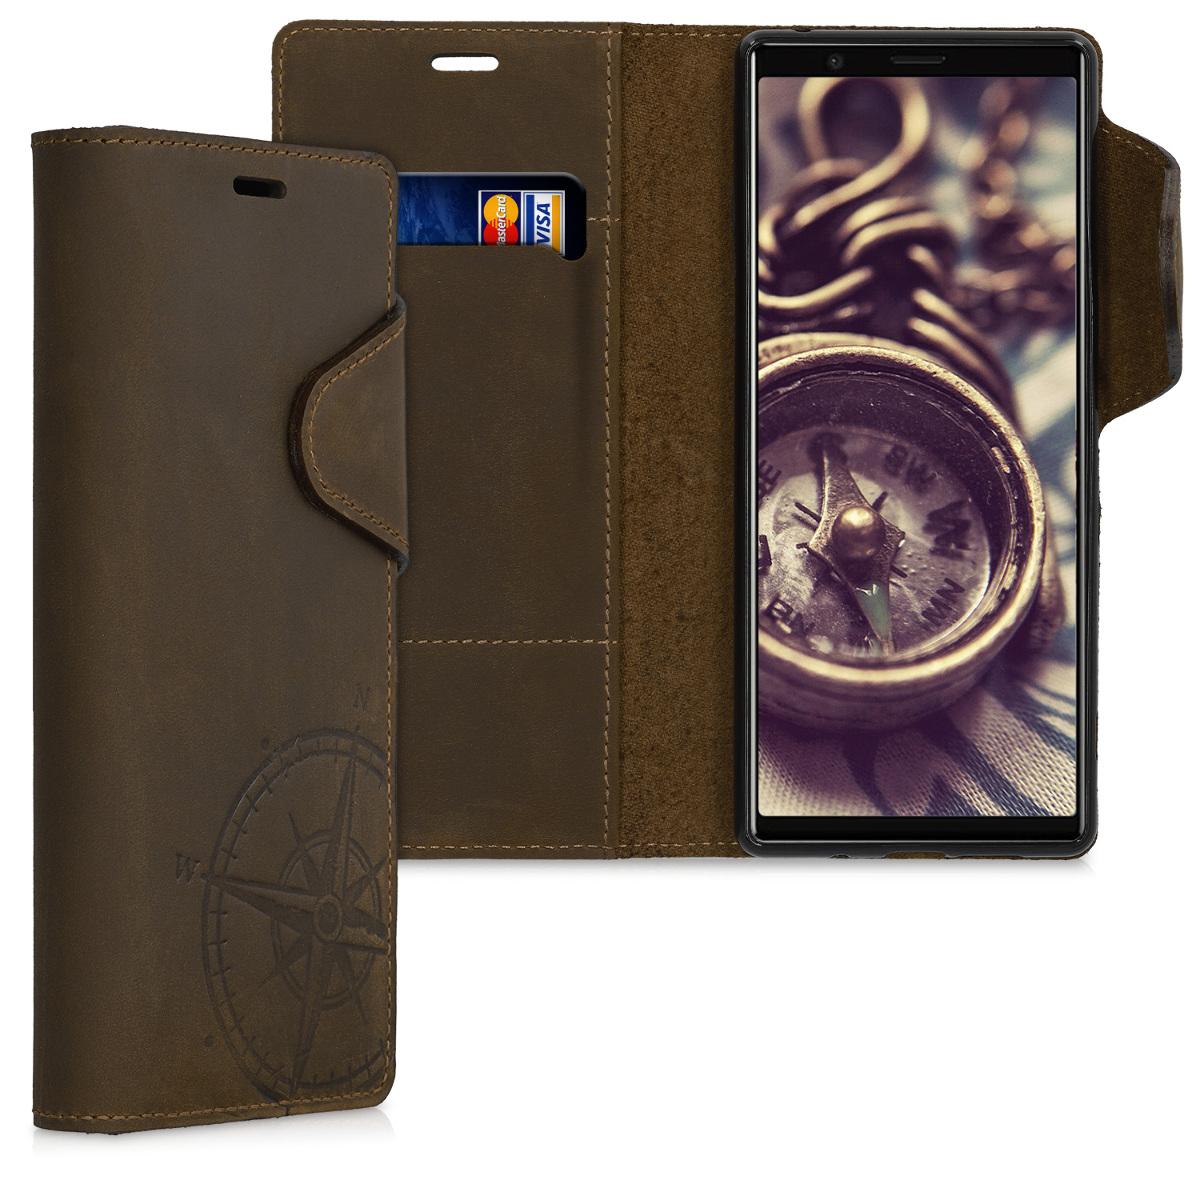 Kalibri Δερμάτινη Suede Θήκη - Πορτοφόλι Sony Xperia 5 - Brown (50118.01)